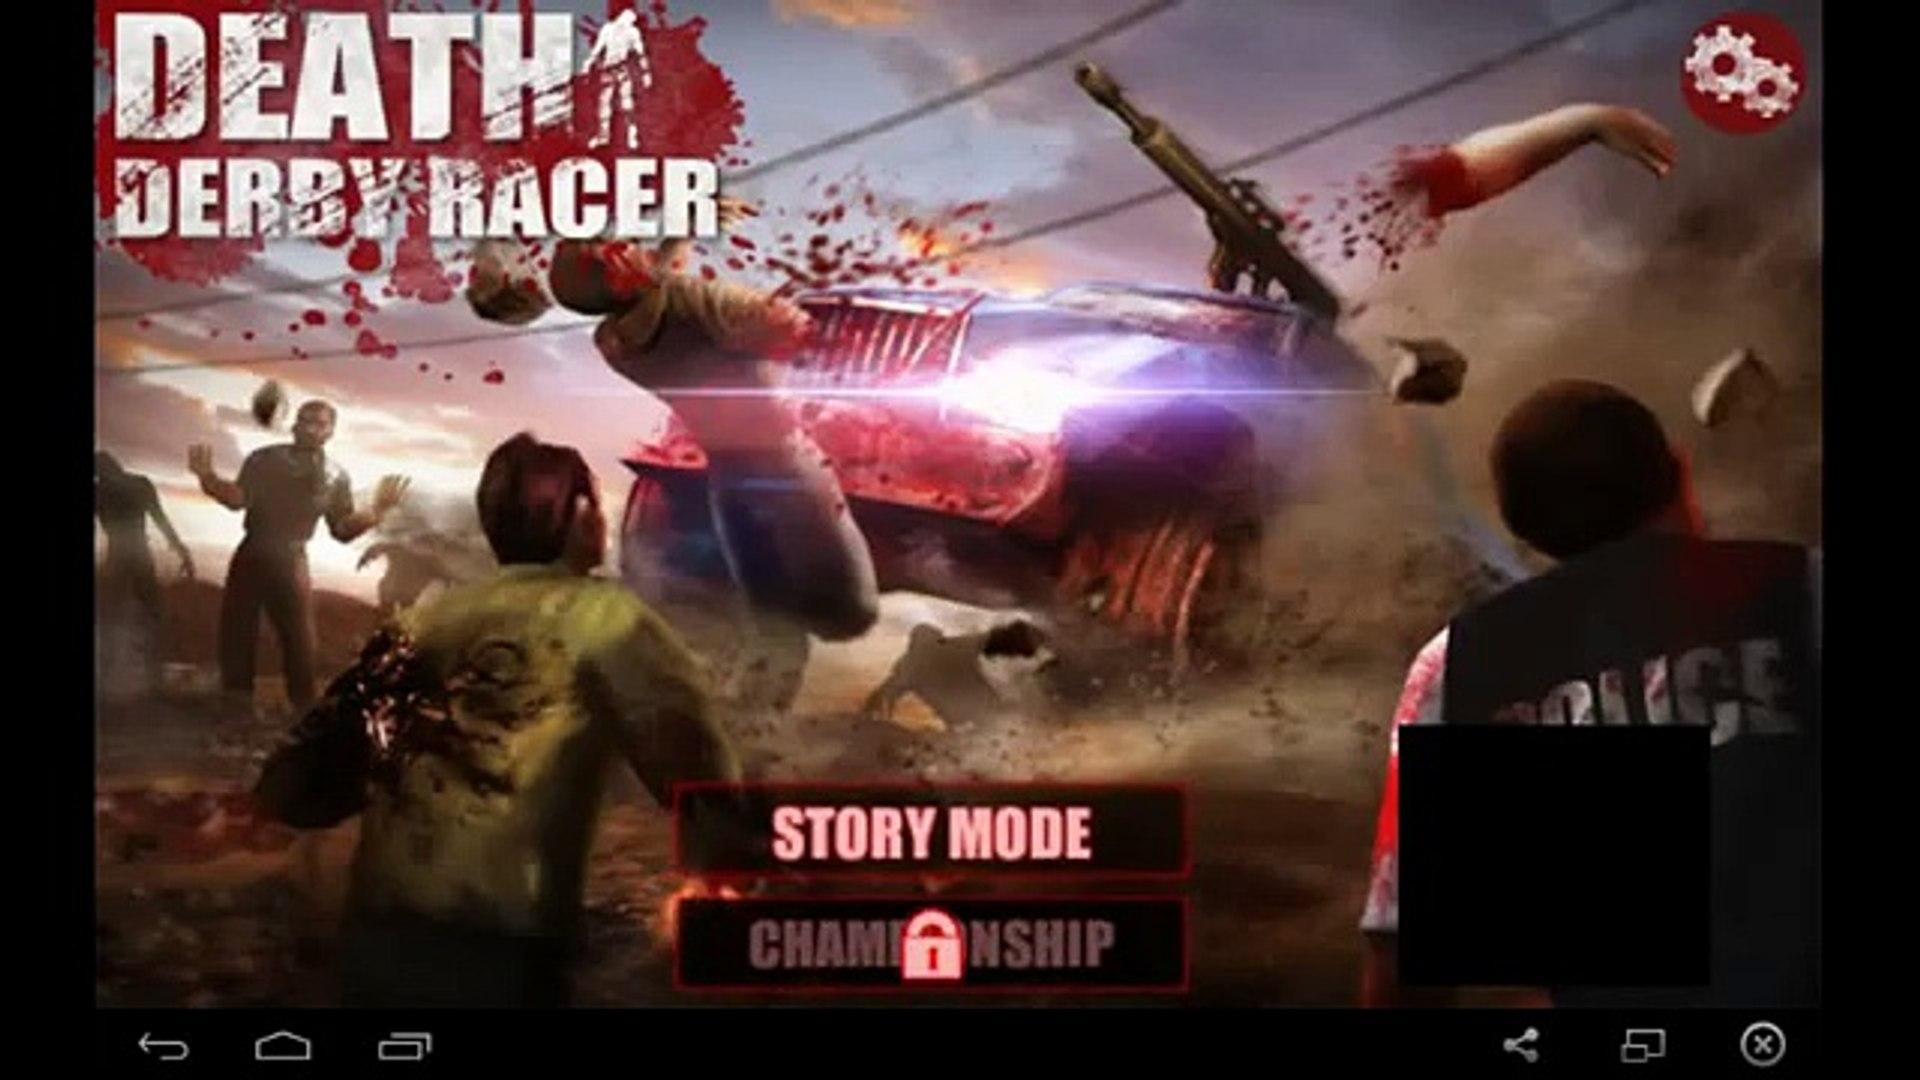 Death Derby Racer Zombie гонки / Death Derby Racer: Zombie Race - for Android and iOS GamePlay